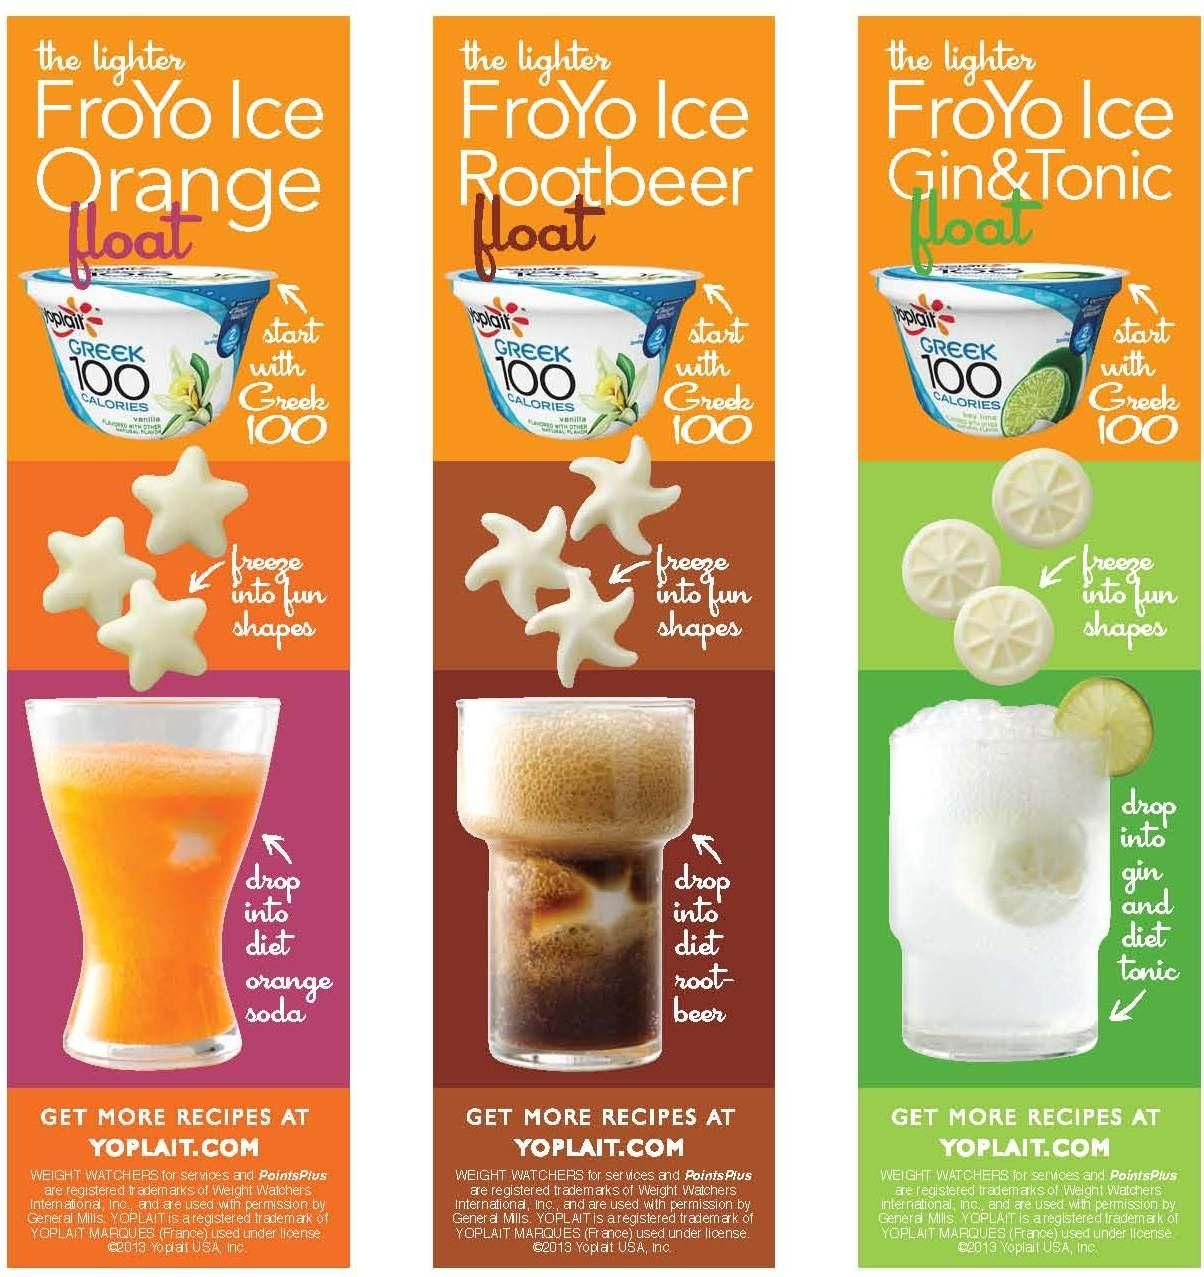 Froyo beverage recipes from Yoplait Greek 100